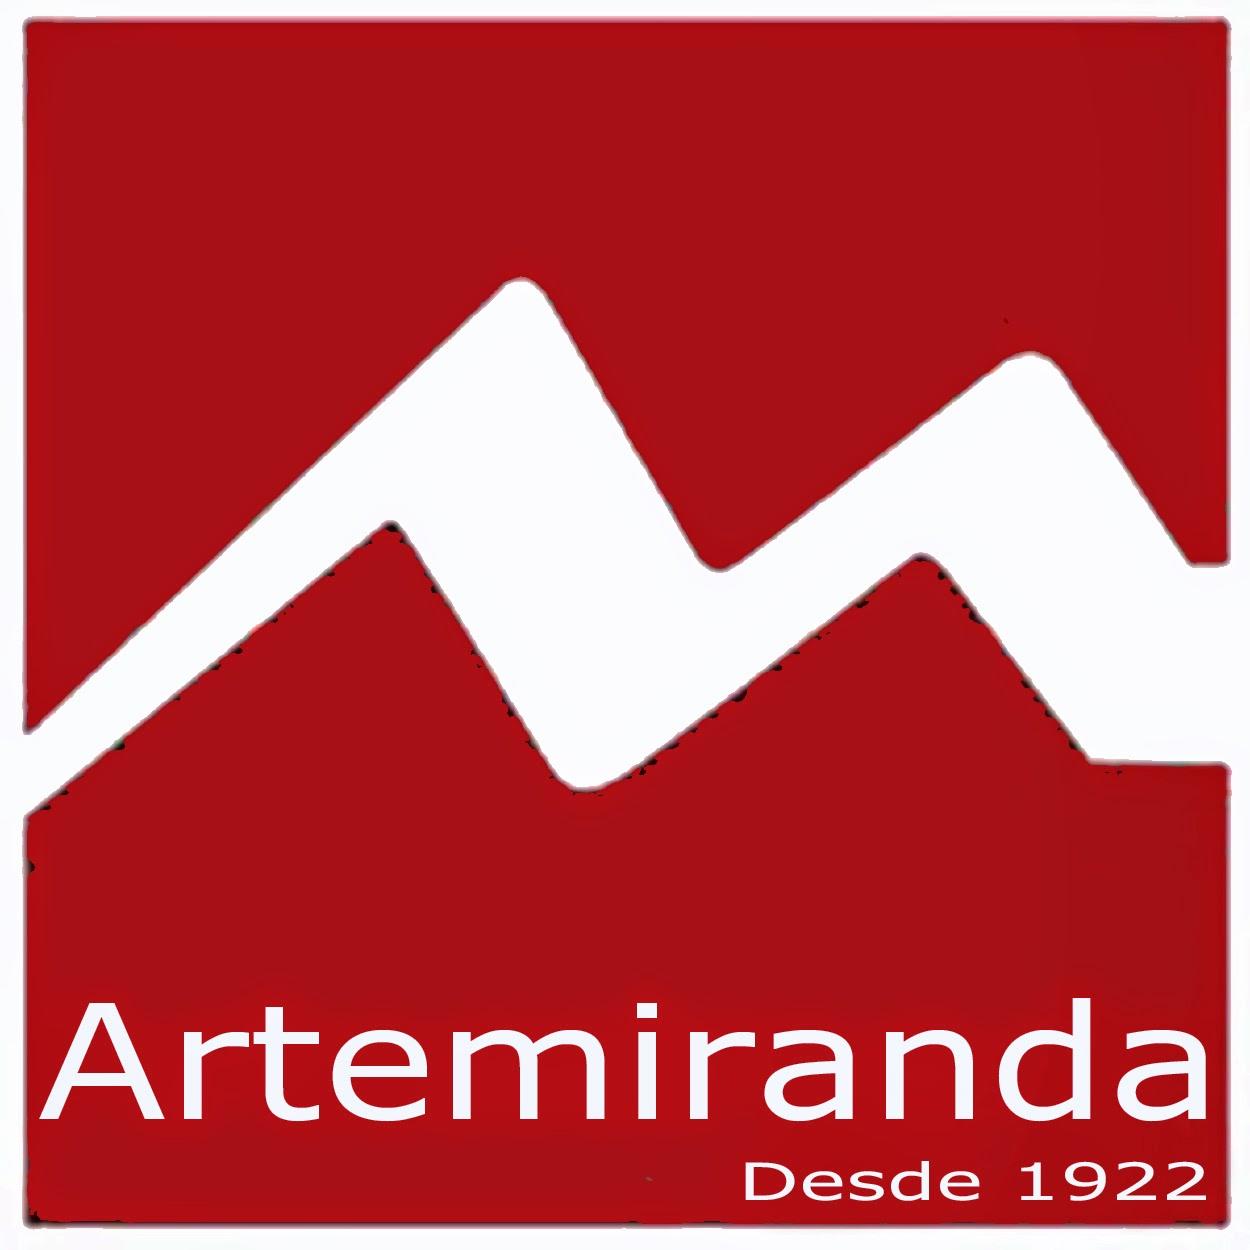 http://www.artemiranda.es/